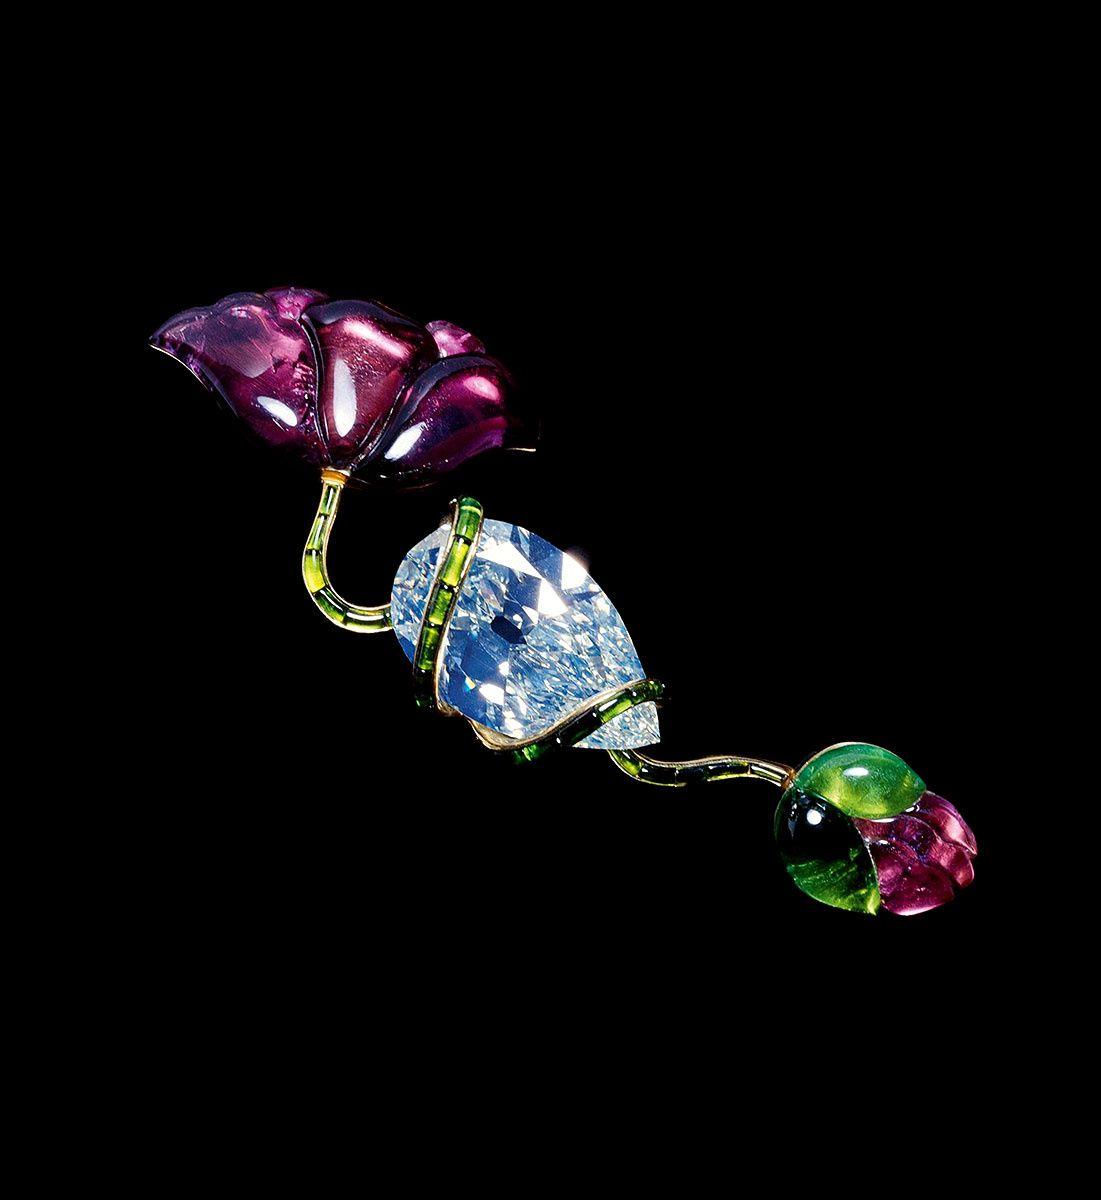 ba68b161949c Exposicion MET joyas Jewels by JAR Joel A Rosenthal